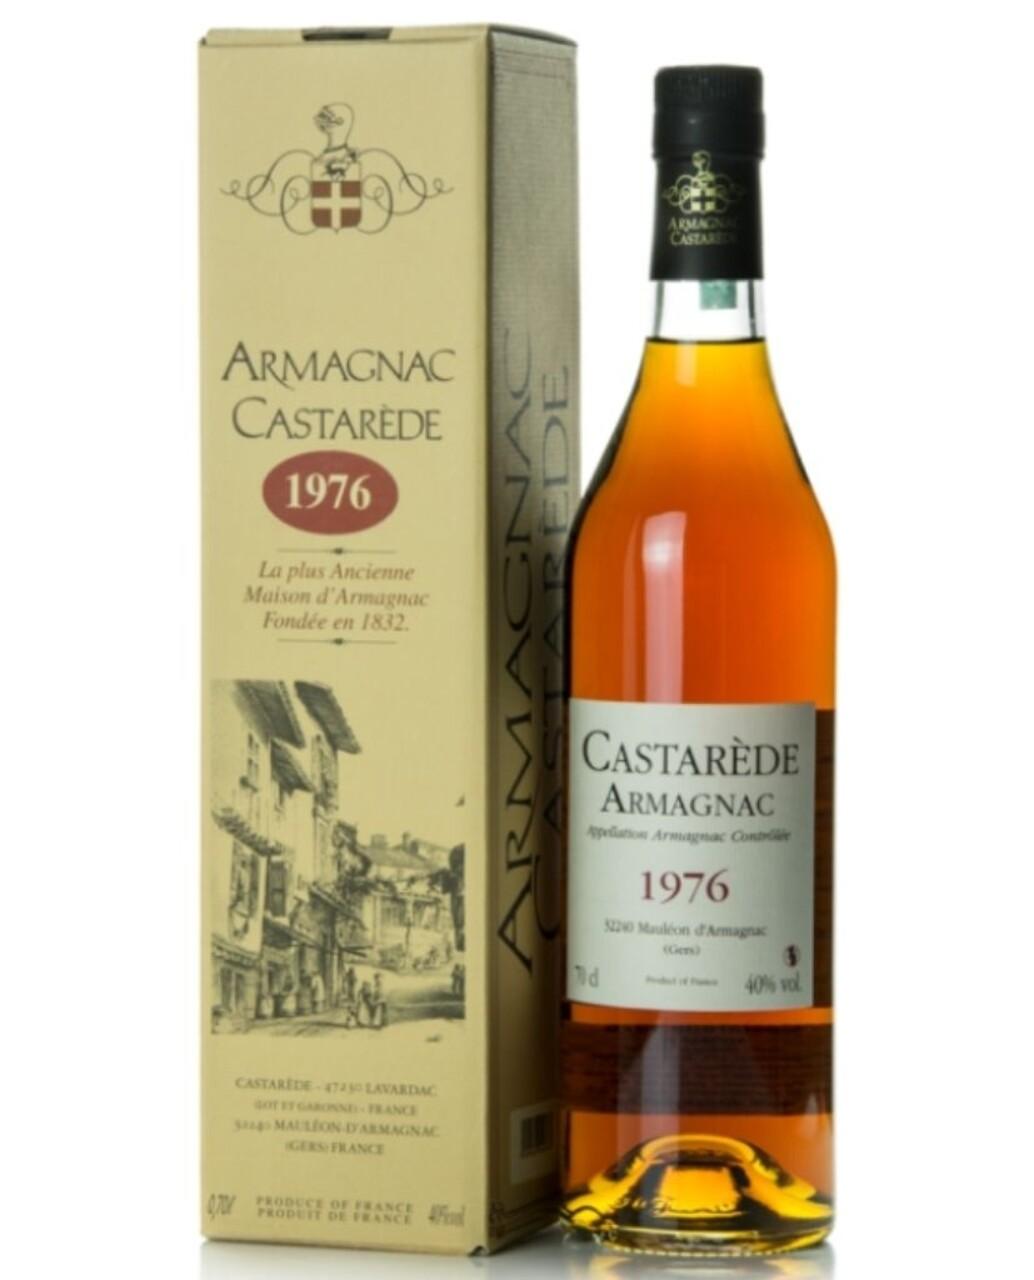 ARMAGNAC CASTAREDE 1976